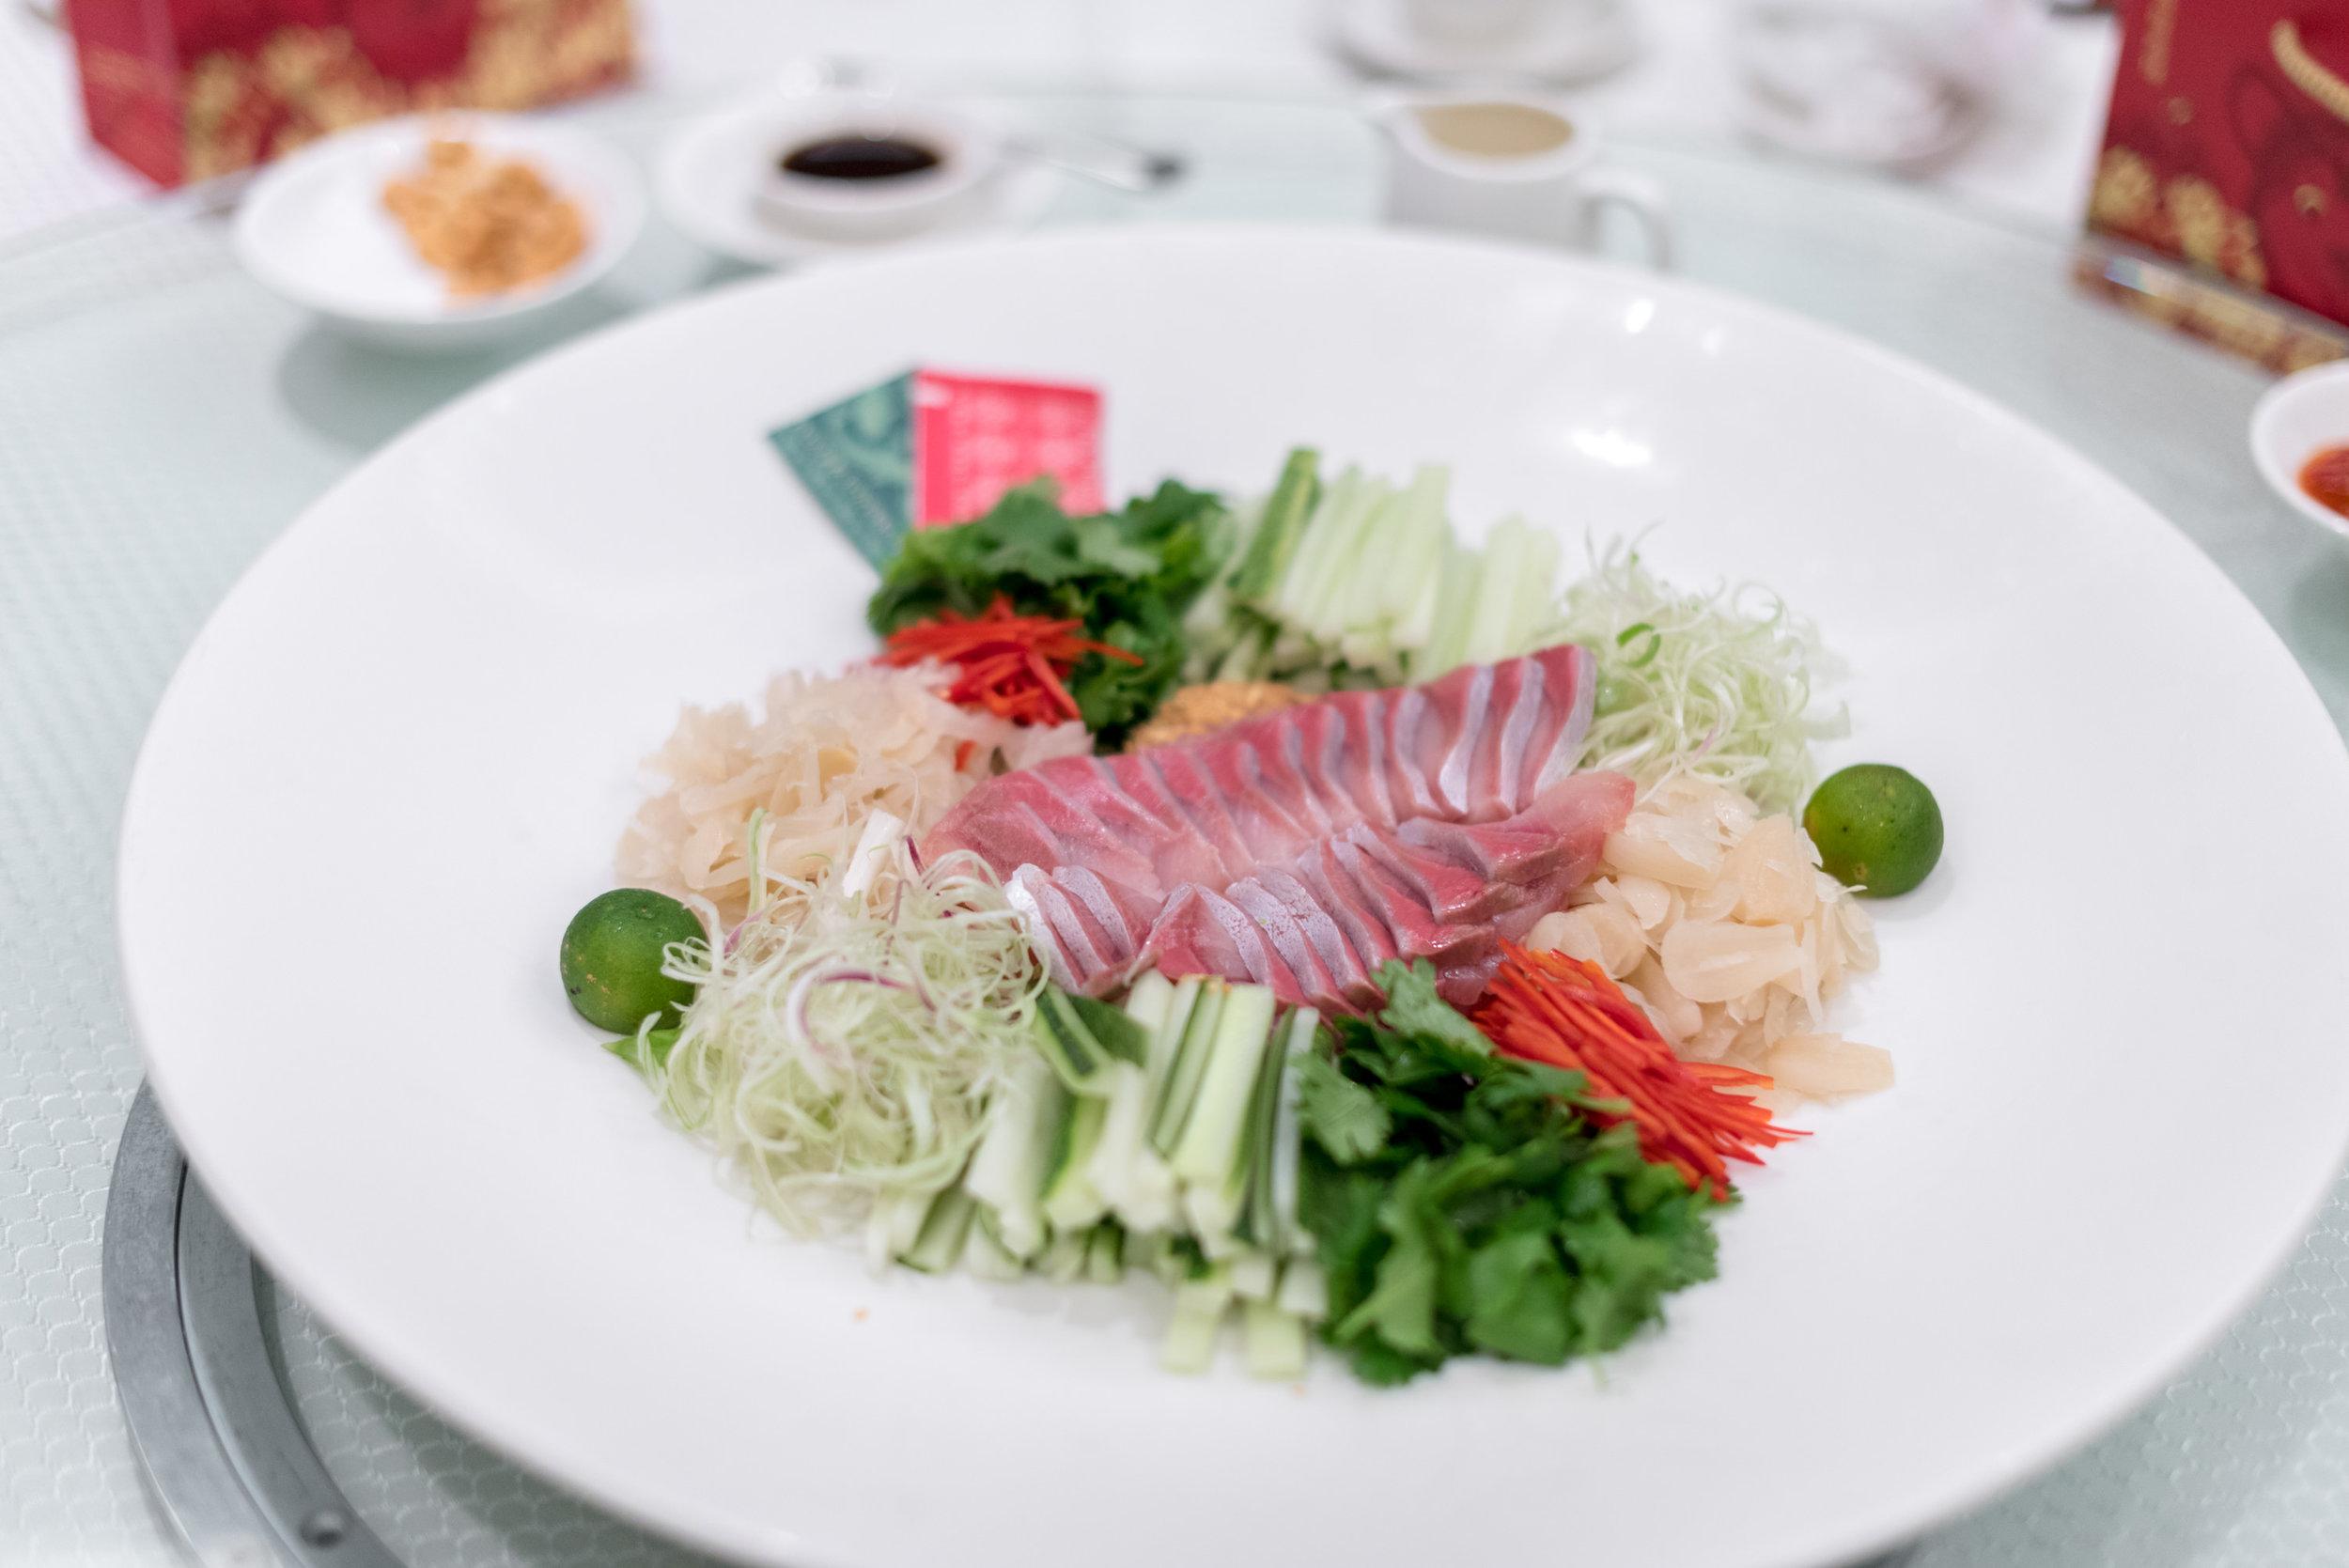 Hamachi Yu Sheng 'Soon Tak' Style  Wah Lok Cantonese Restaurant - Carlton Hotel Singapore